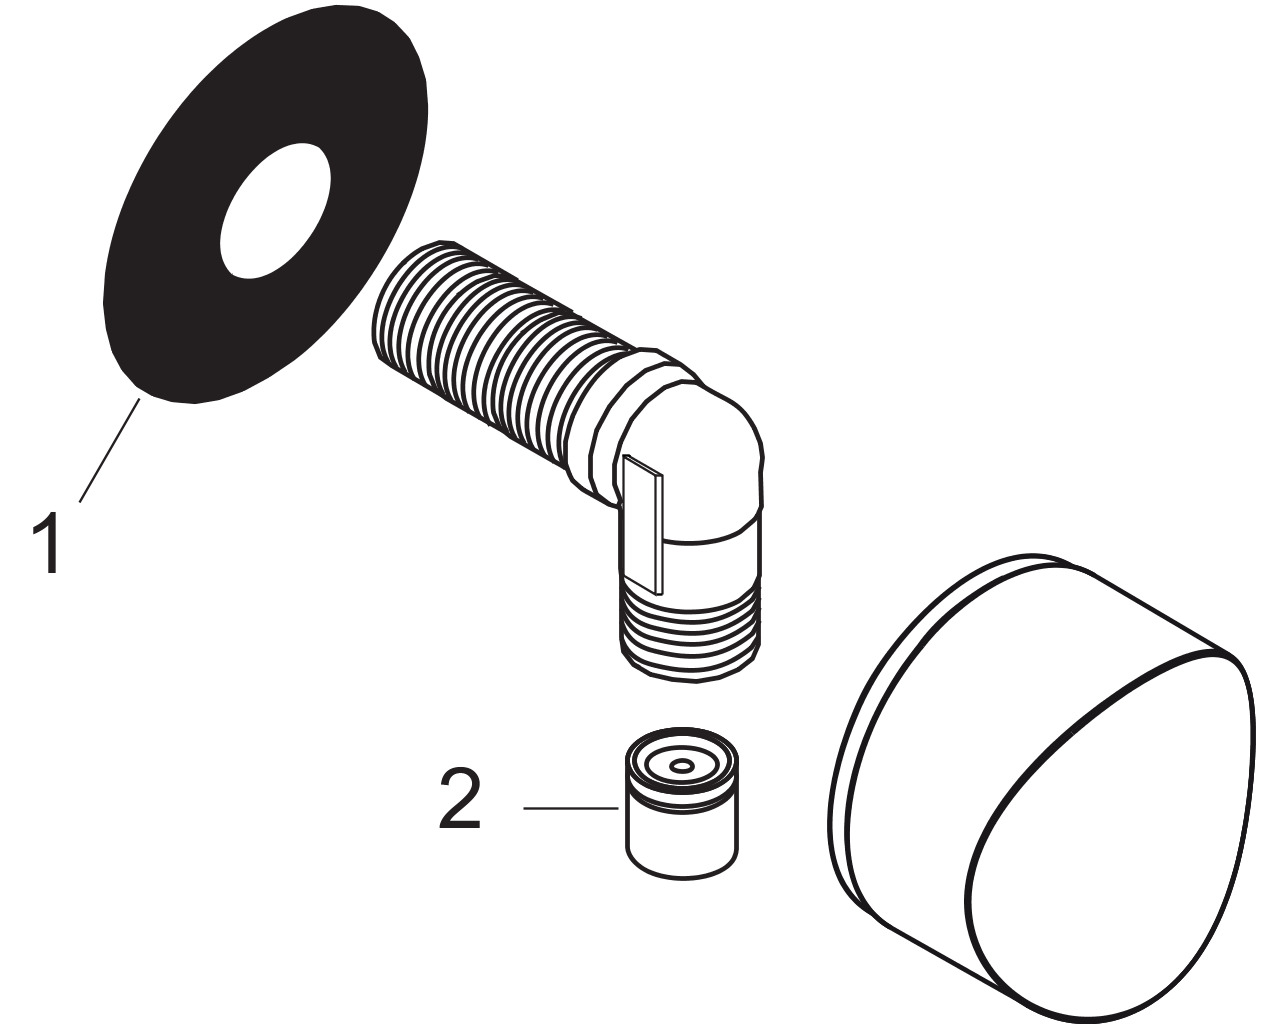 HG Schlauchanschluss DN15 Fixfit S mit Rückflussverhinderer